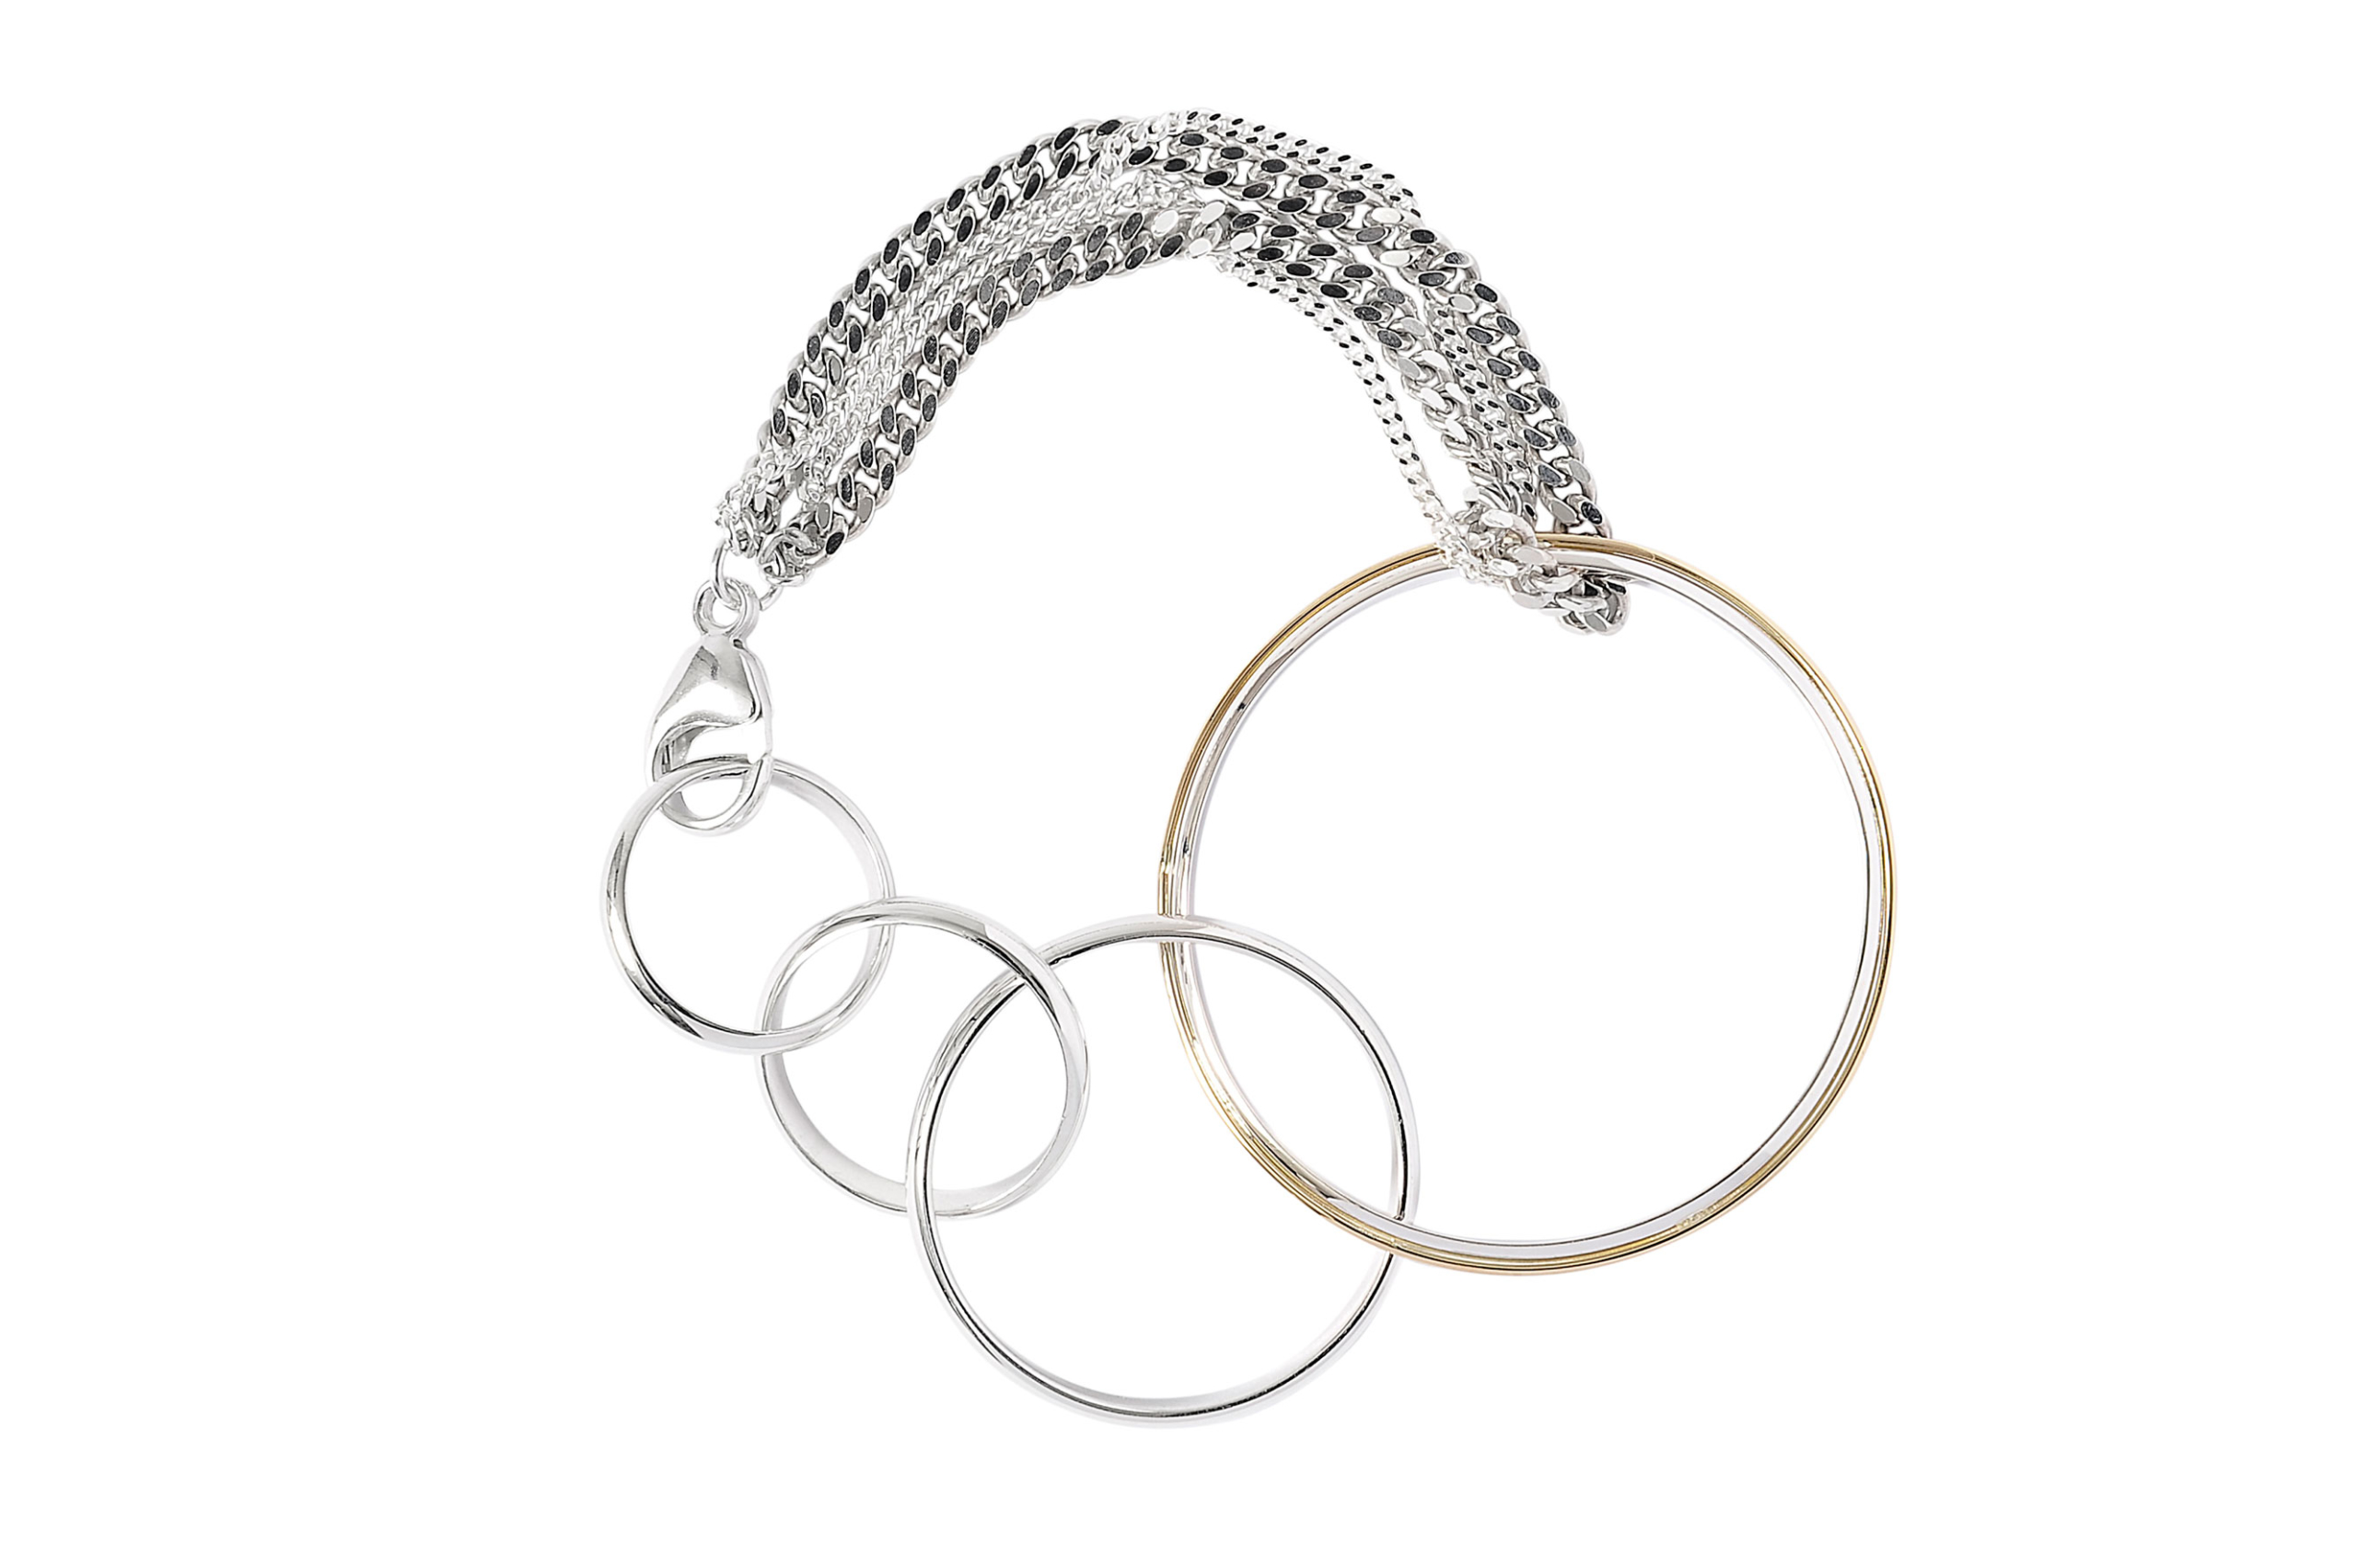 adeline cacheux bracelet silver